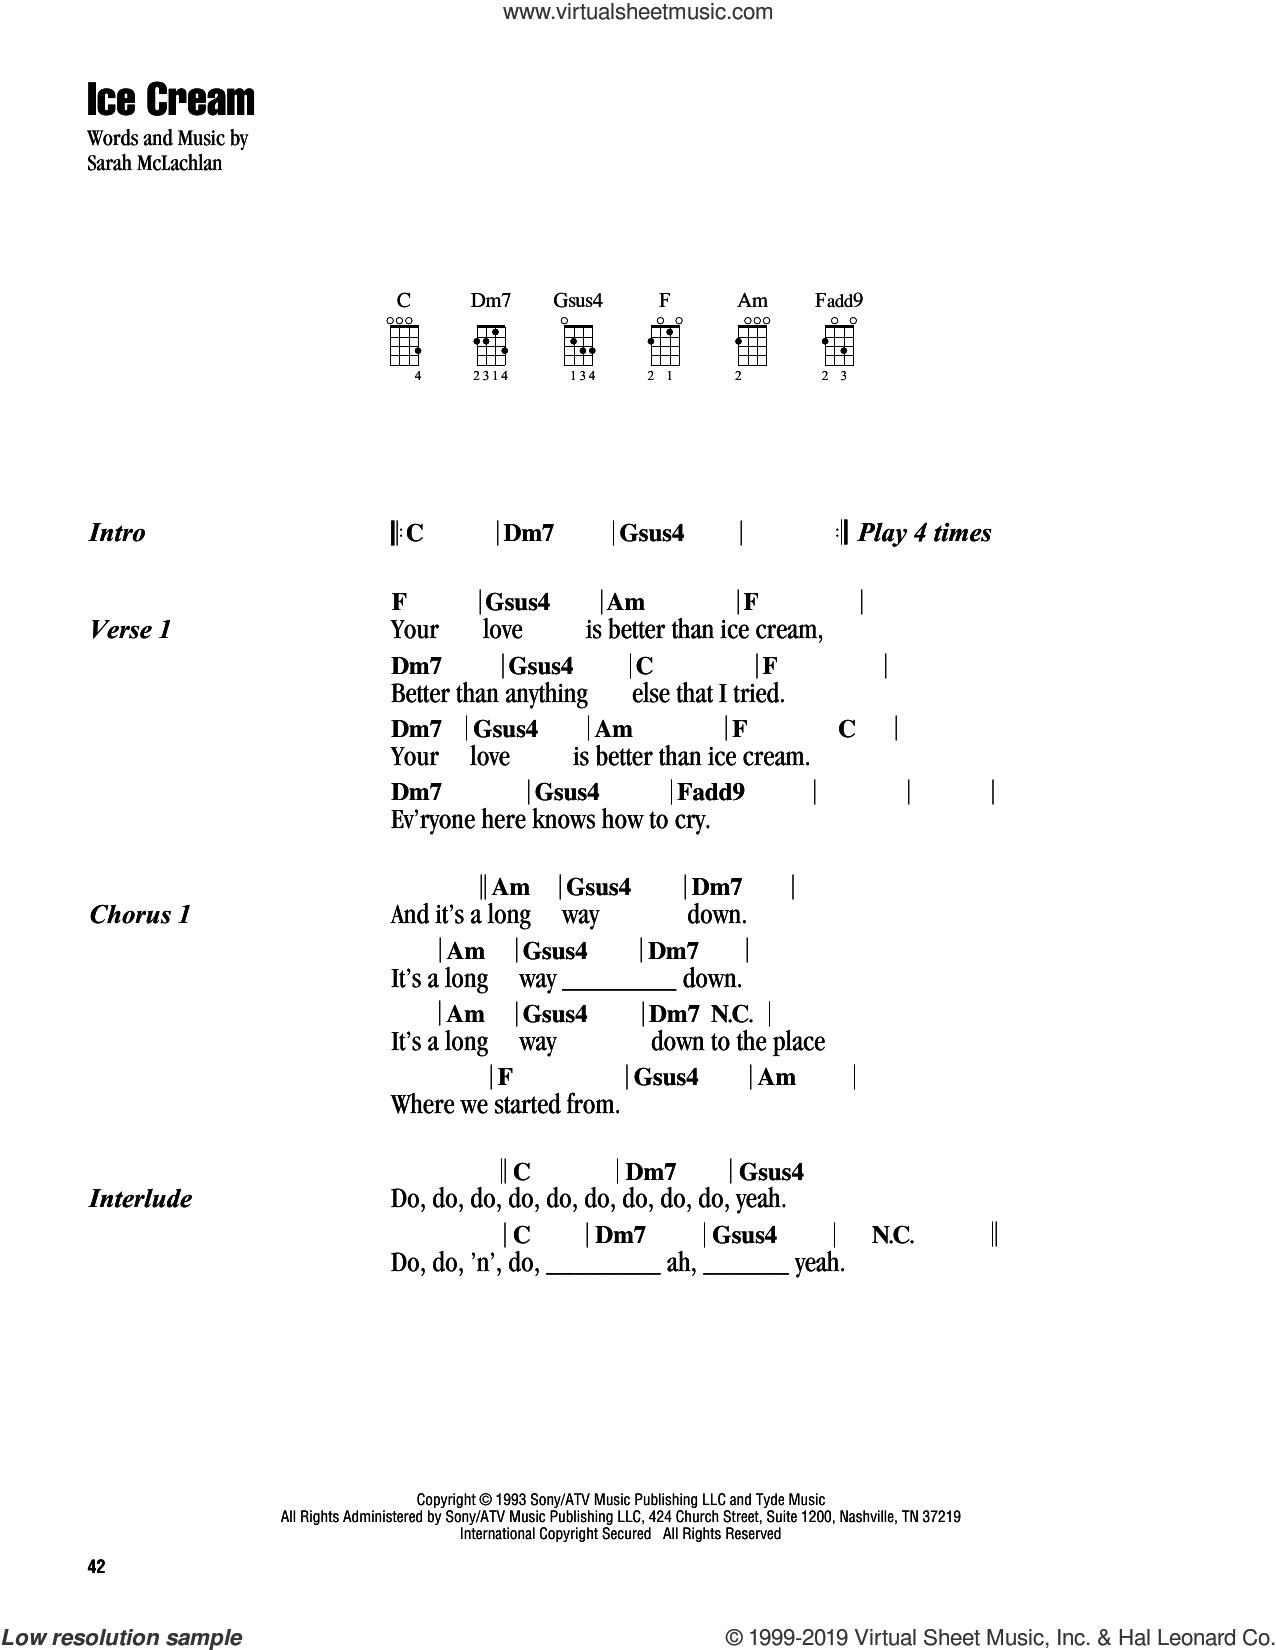 Ice Cream sheet music for ukulele (chords) by Sarah McLachlan, intermediate skill level